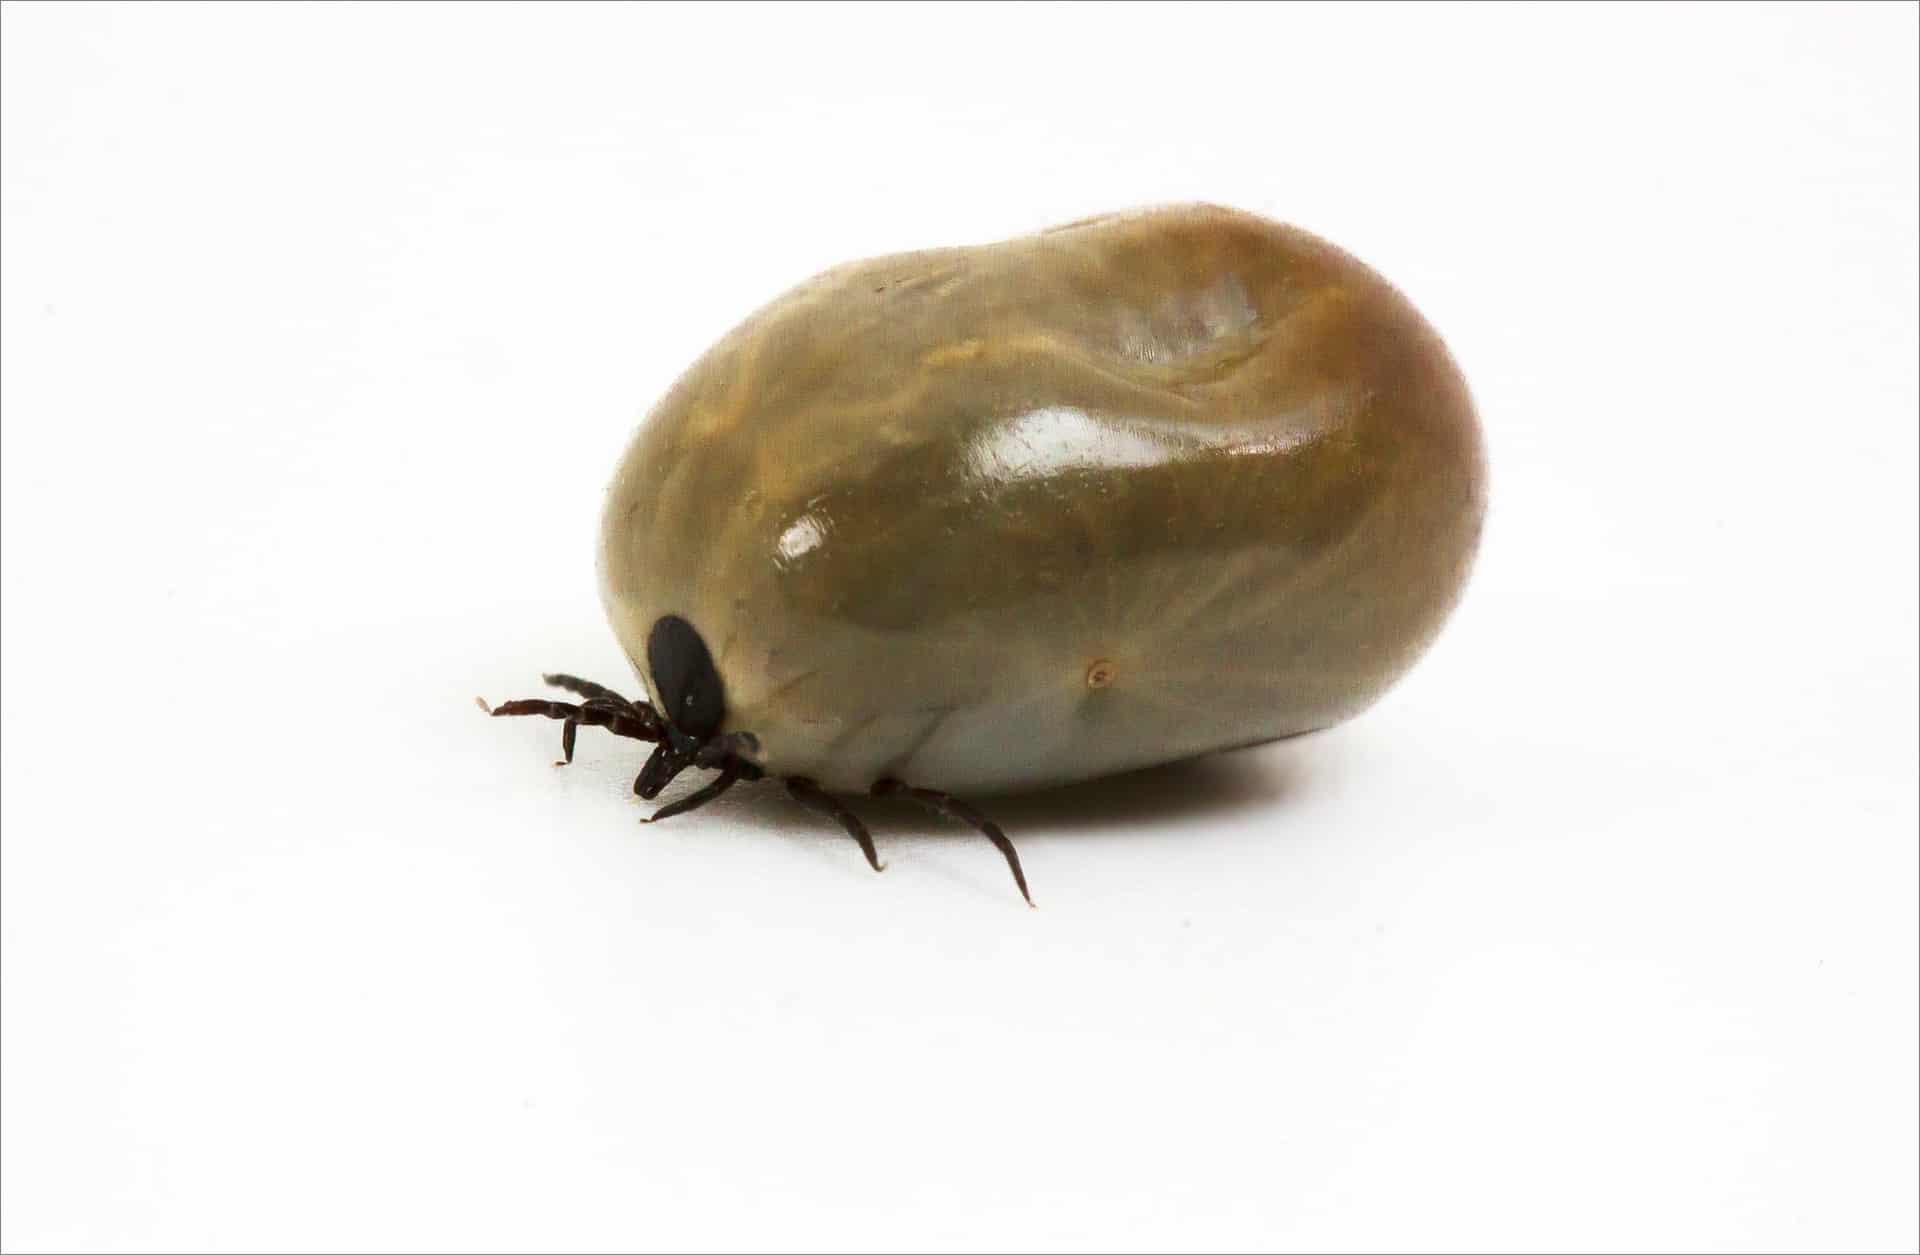 Parásitos externos: Garrapatas - Veterinarium